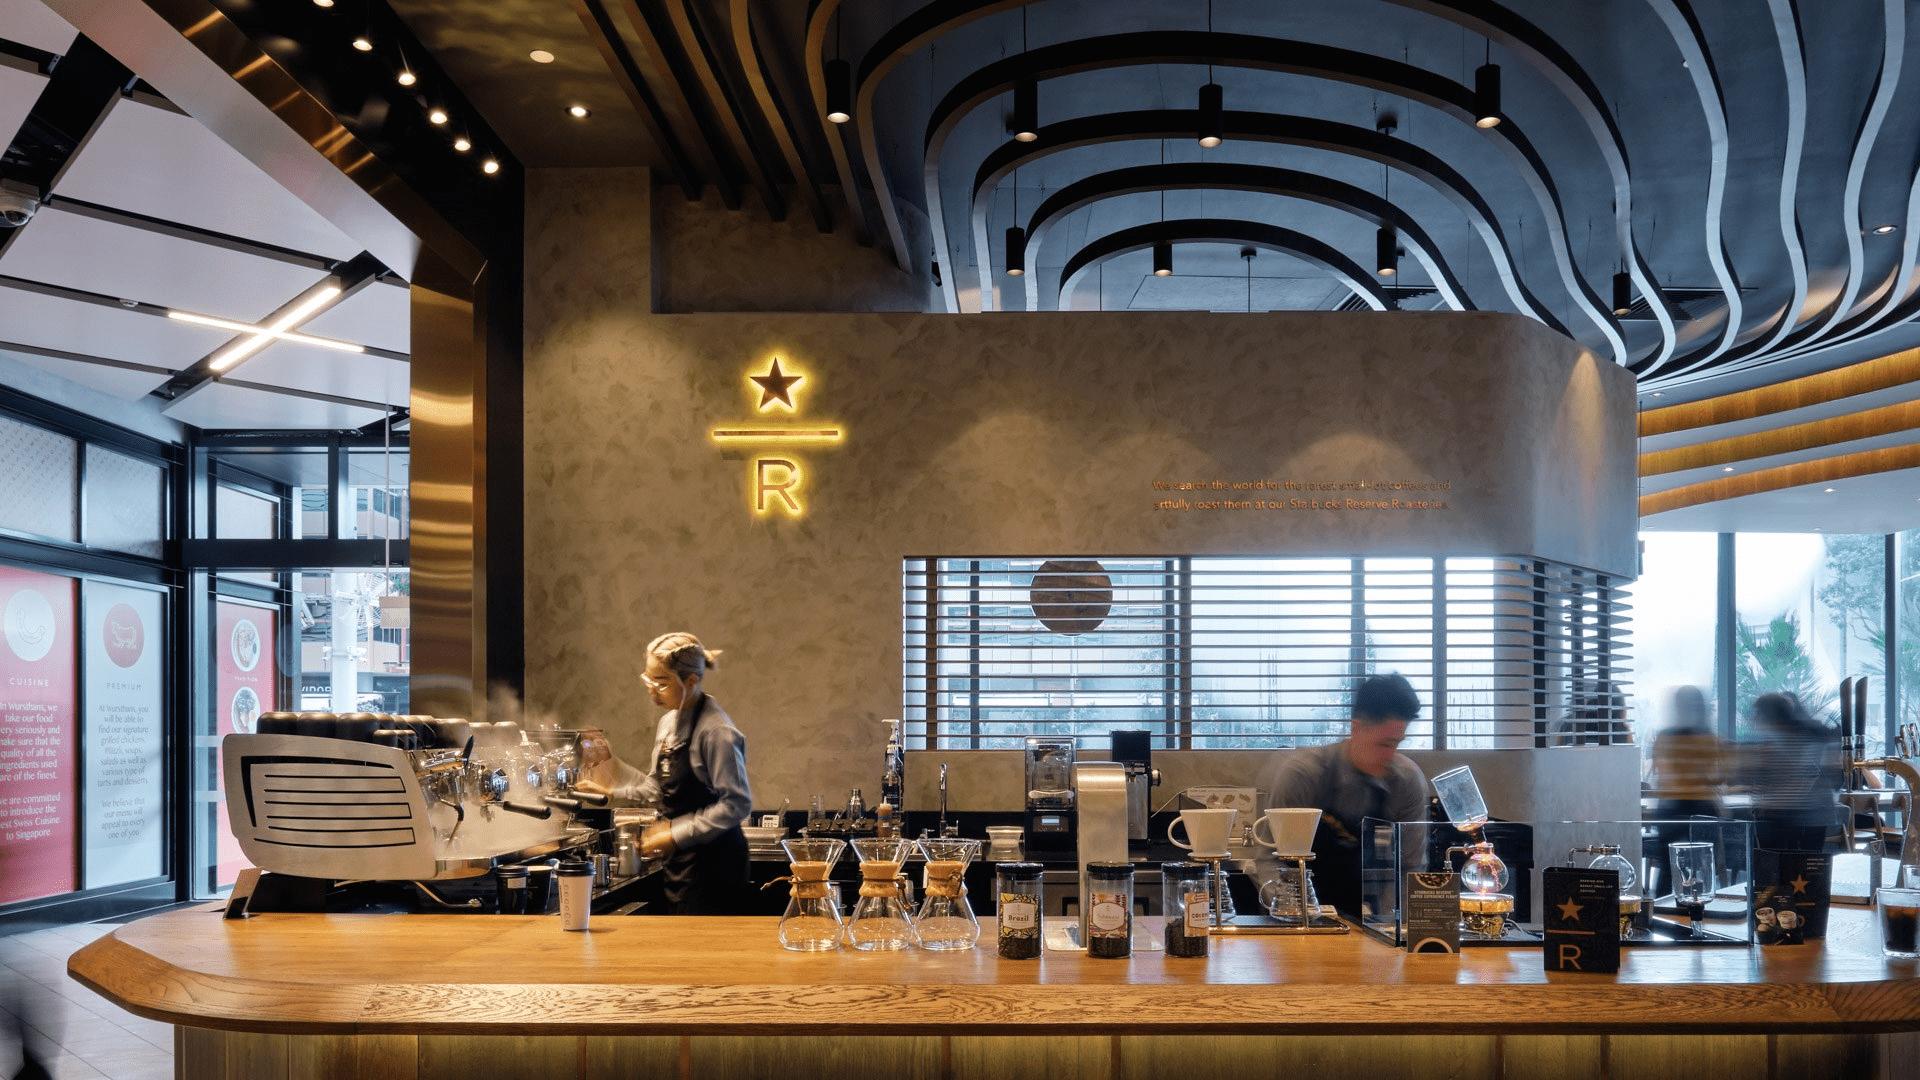 Starbucks Singapore - Paya Lebar Quarter